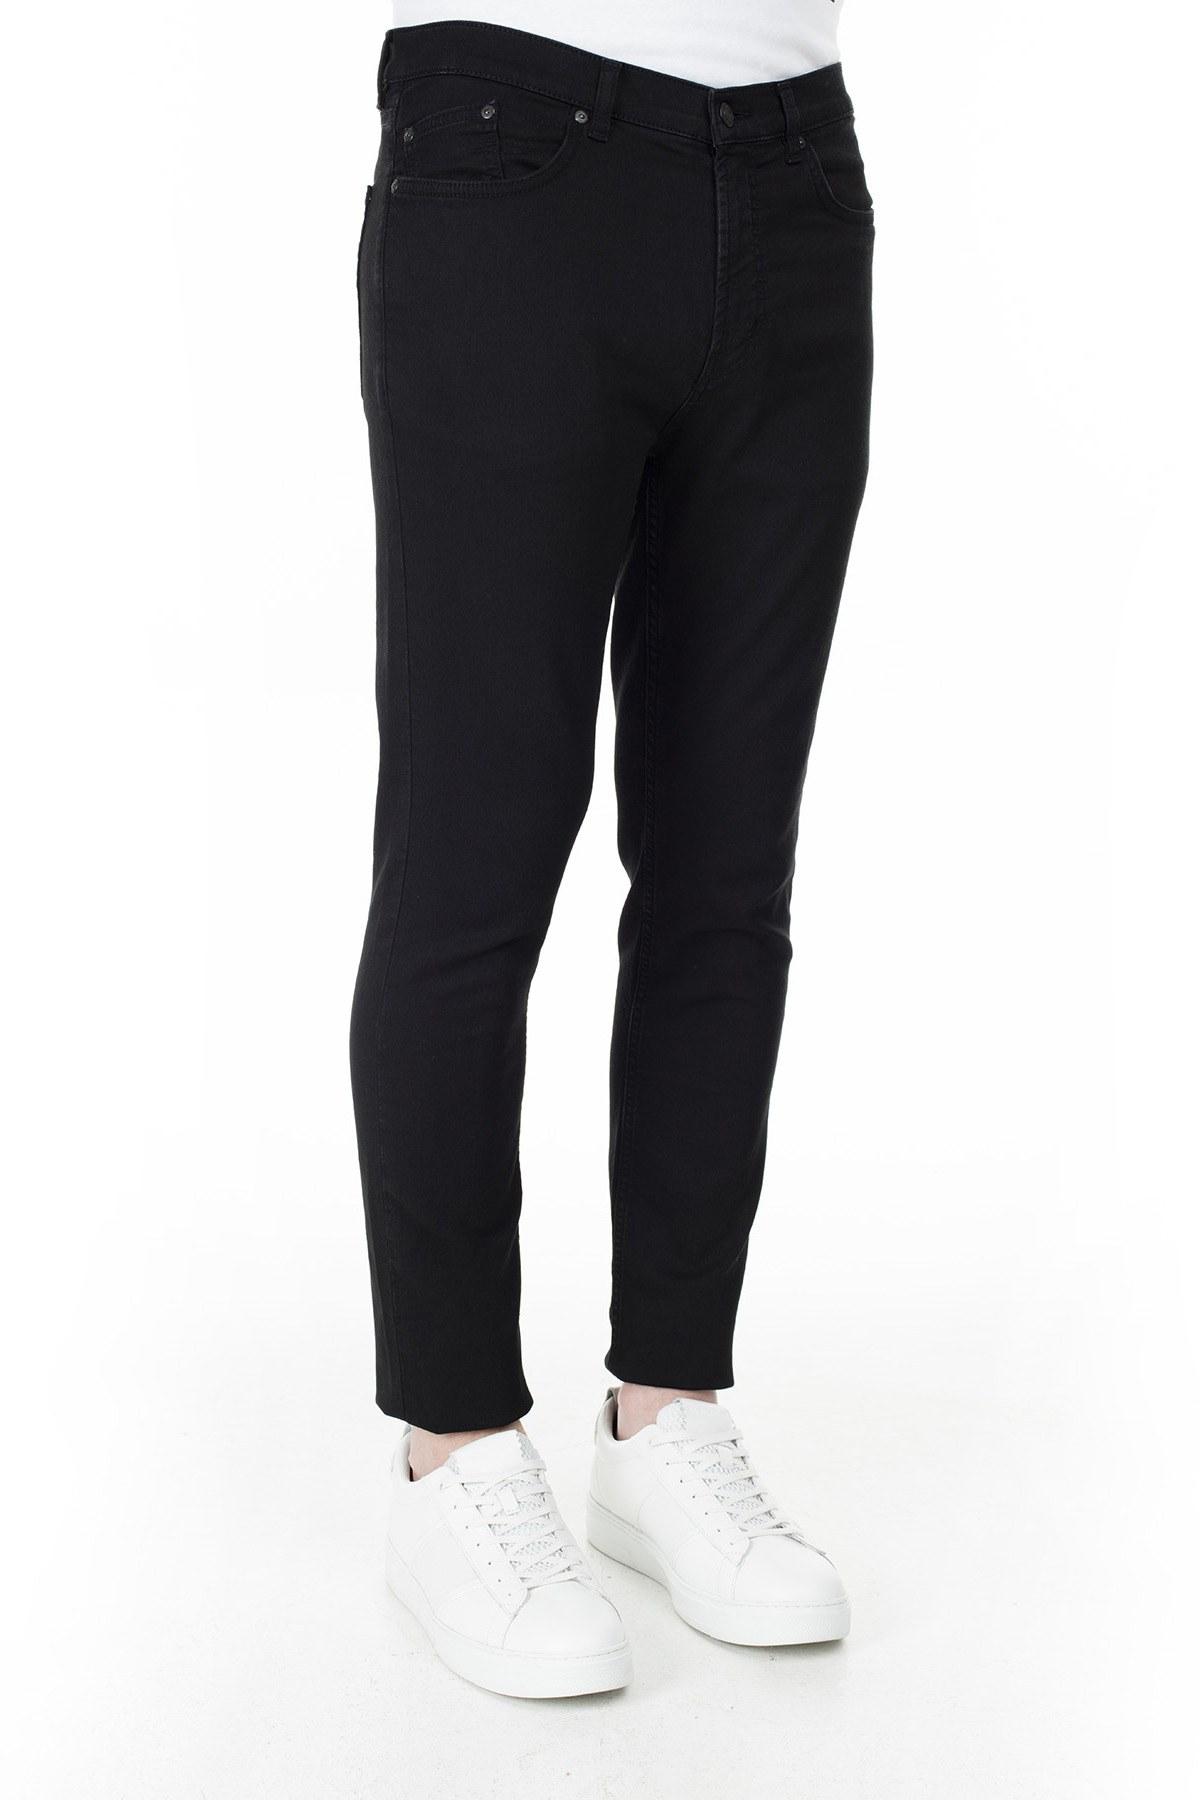 Hugo Boss Slim Fit Jeans Erkek Kot Pantolon 50426695 001 SİYAH